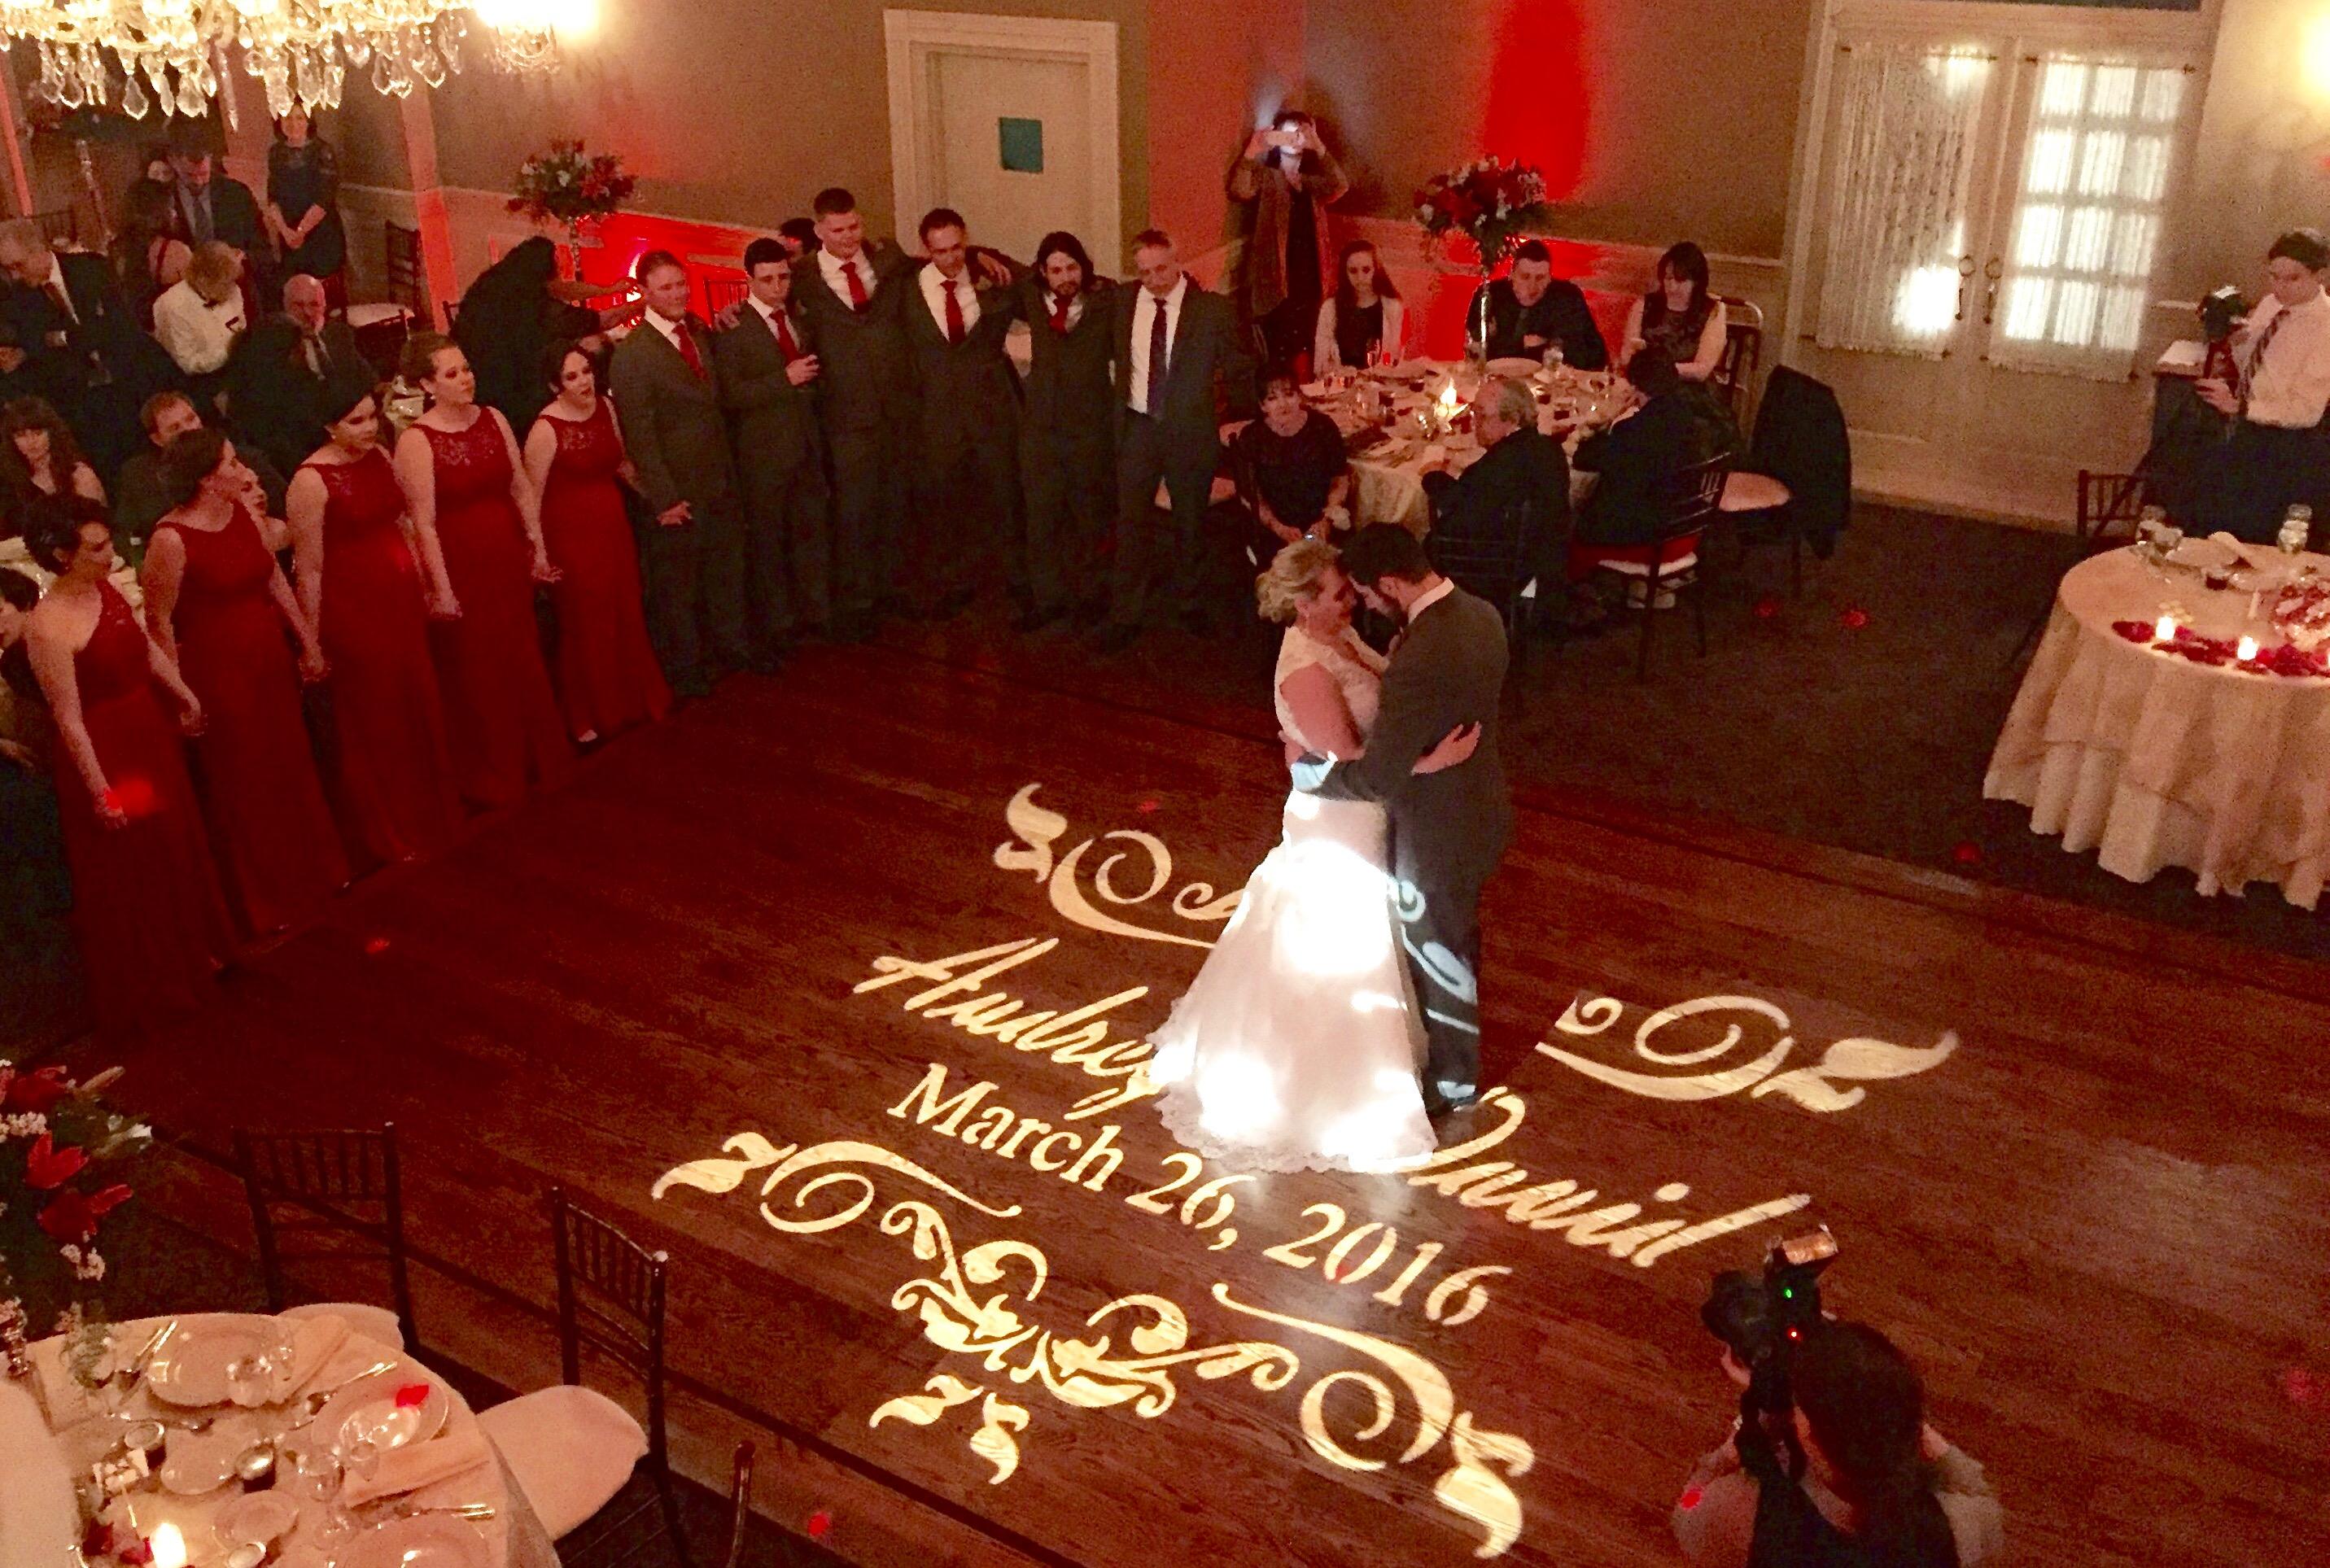 Wedding Gobos At Weddinggobo Com Your Source For Quality Gobos